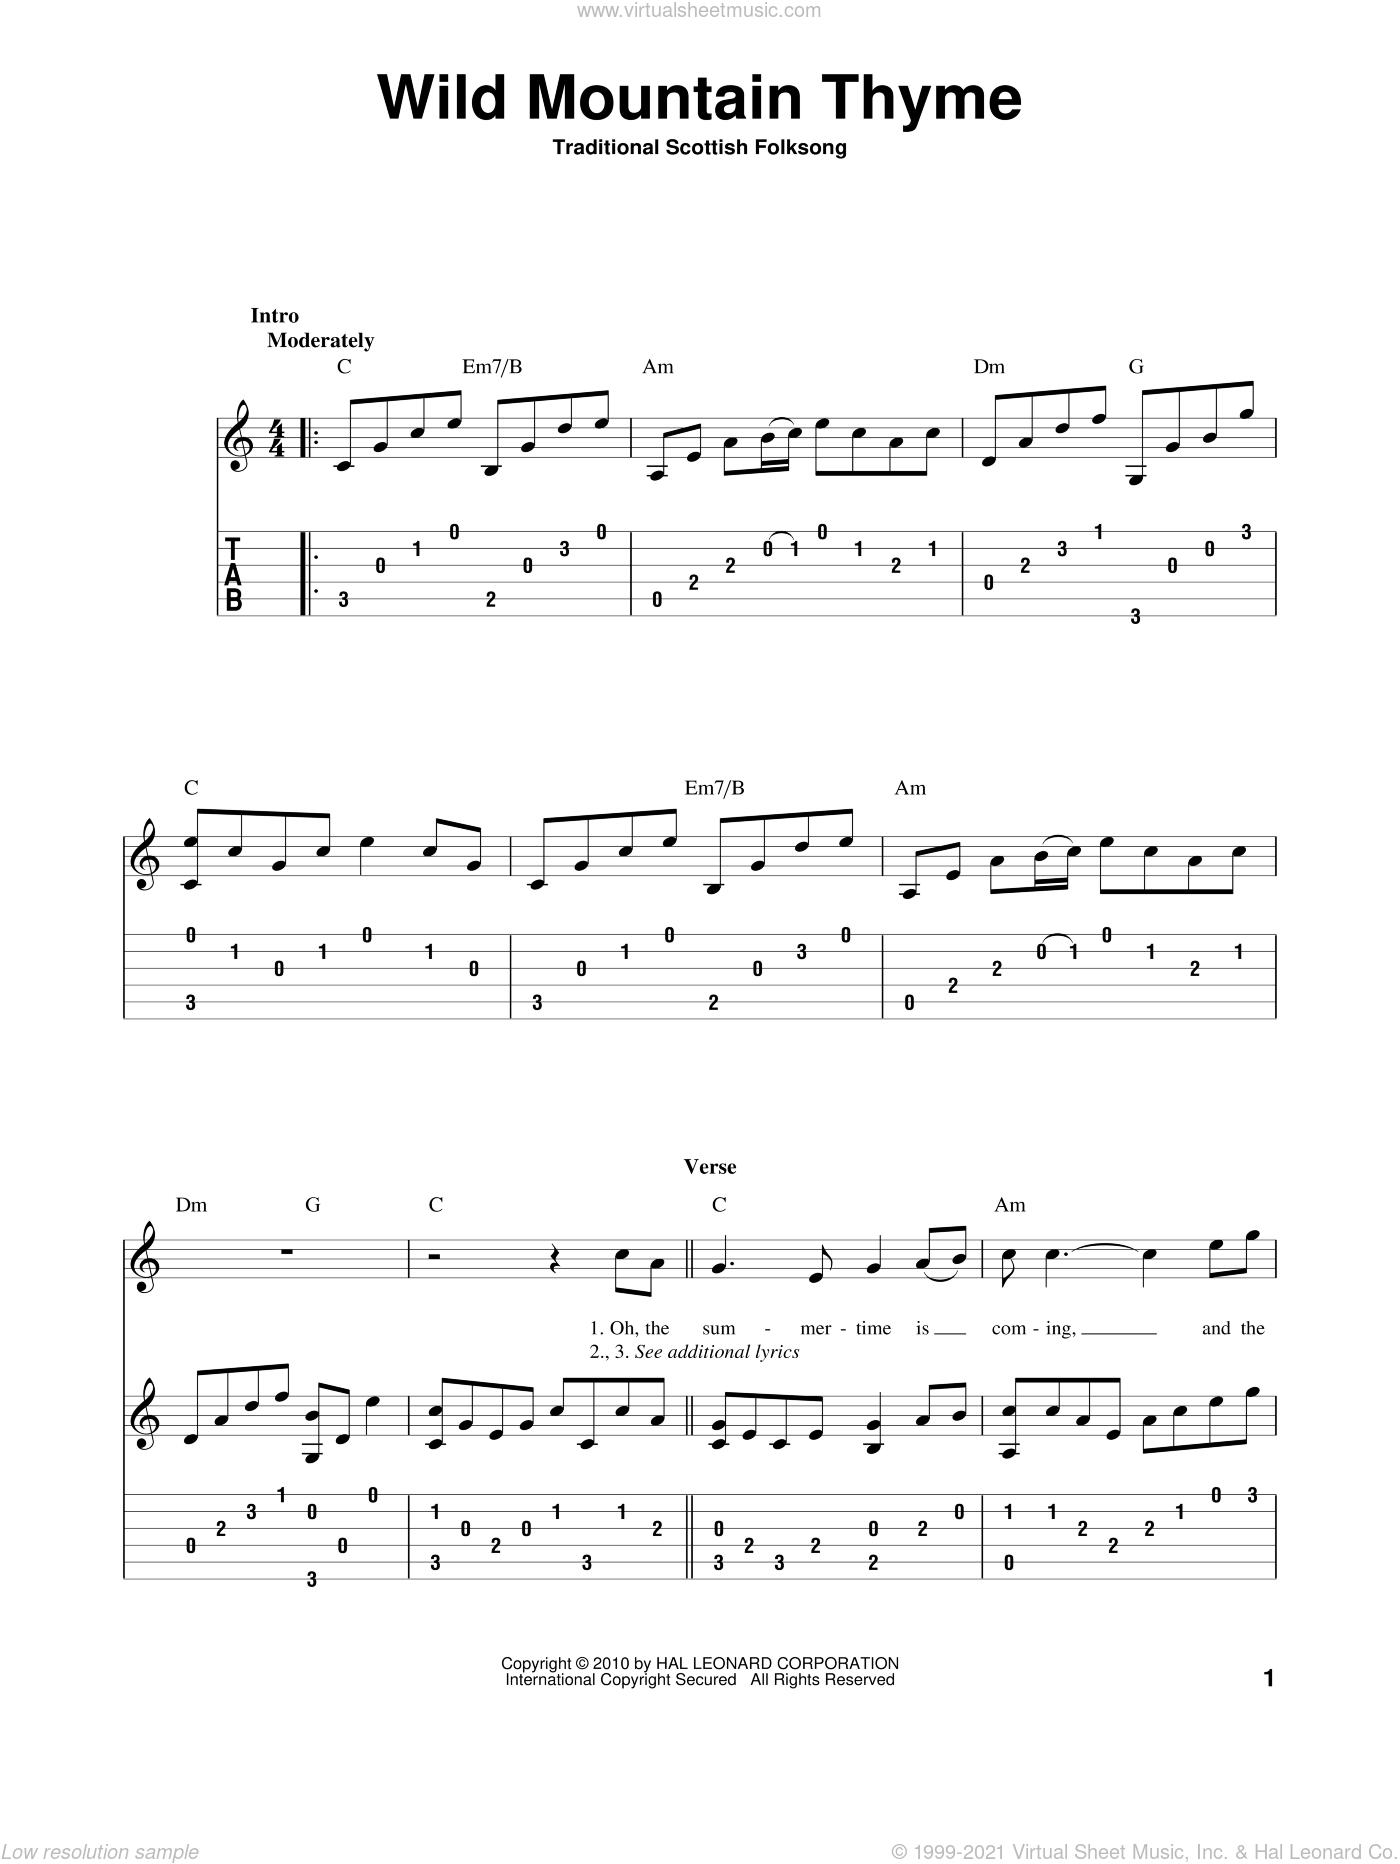 Wild Mountain Thyme sheet music for guitar solo, intermediate skill level